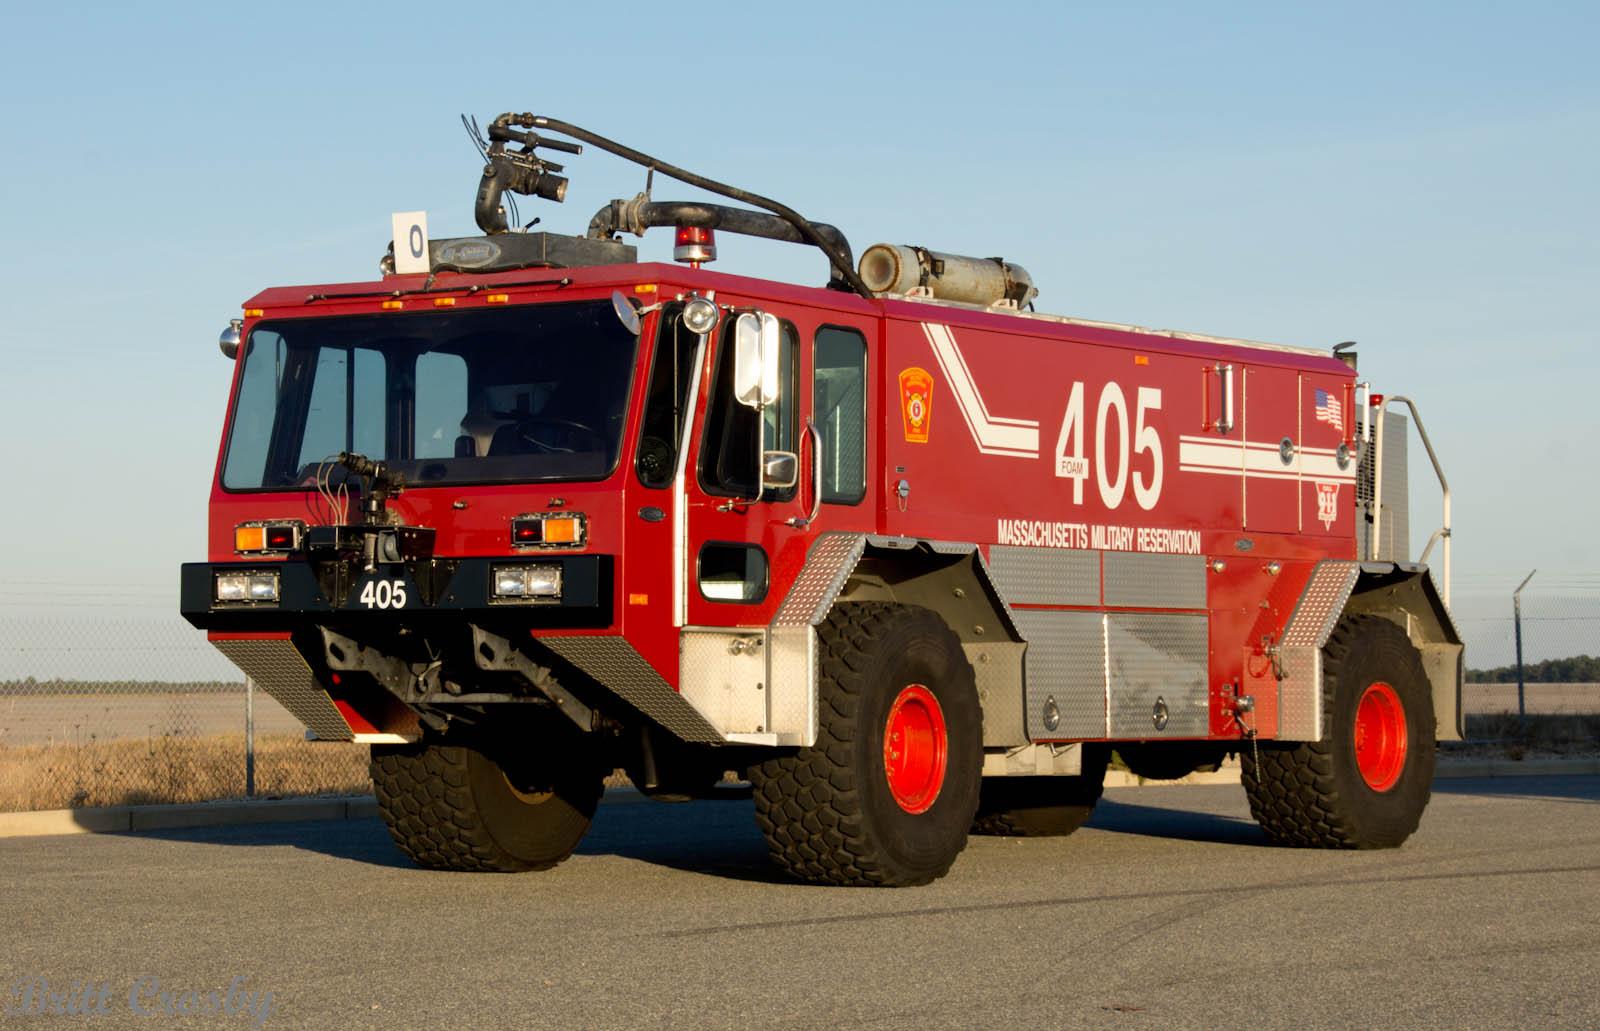 Arff Apparatus Pierce Fire Engine Pump Diagram 1993 Emergency One Titan Truck 1500 200 Refurbed In 2003 Acquired By Mmr 2012 Replaced 1986 Oshkosh P19